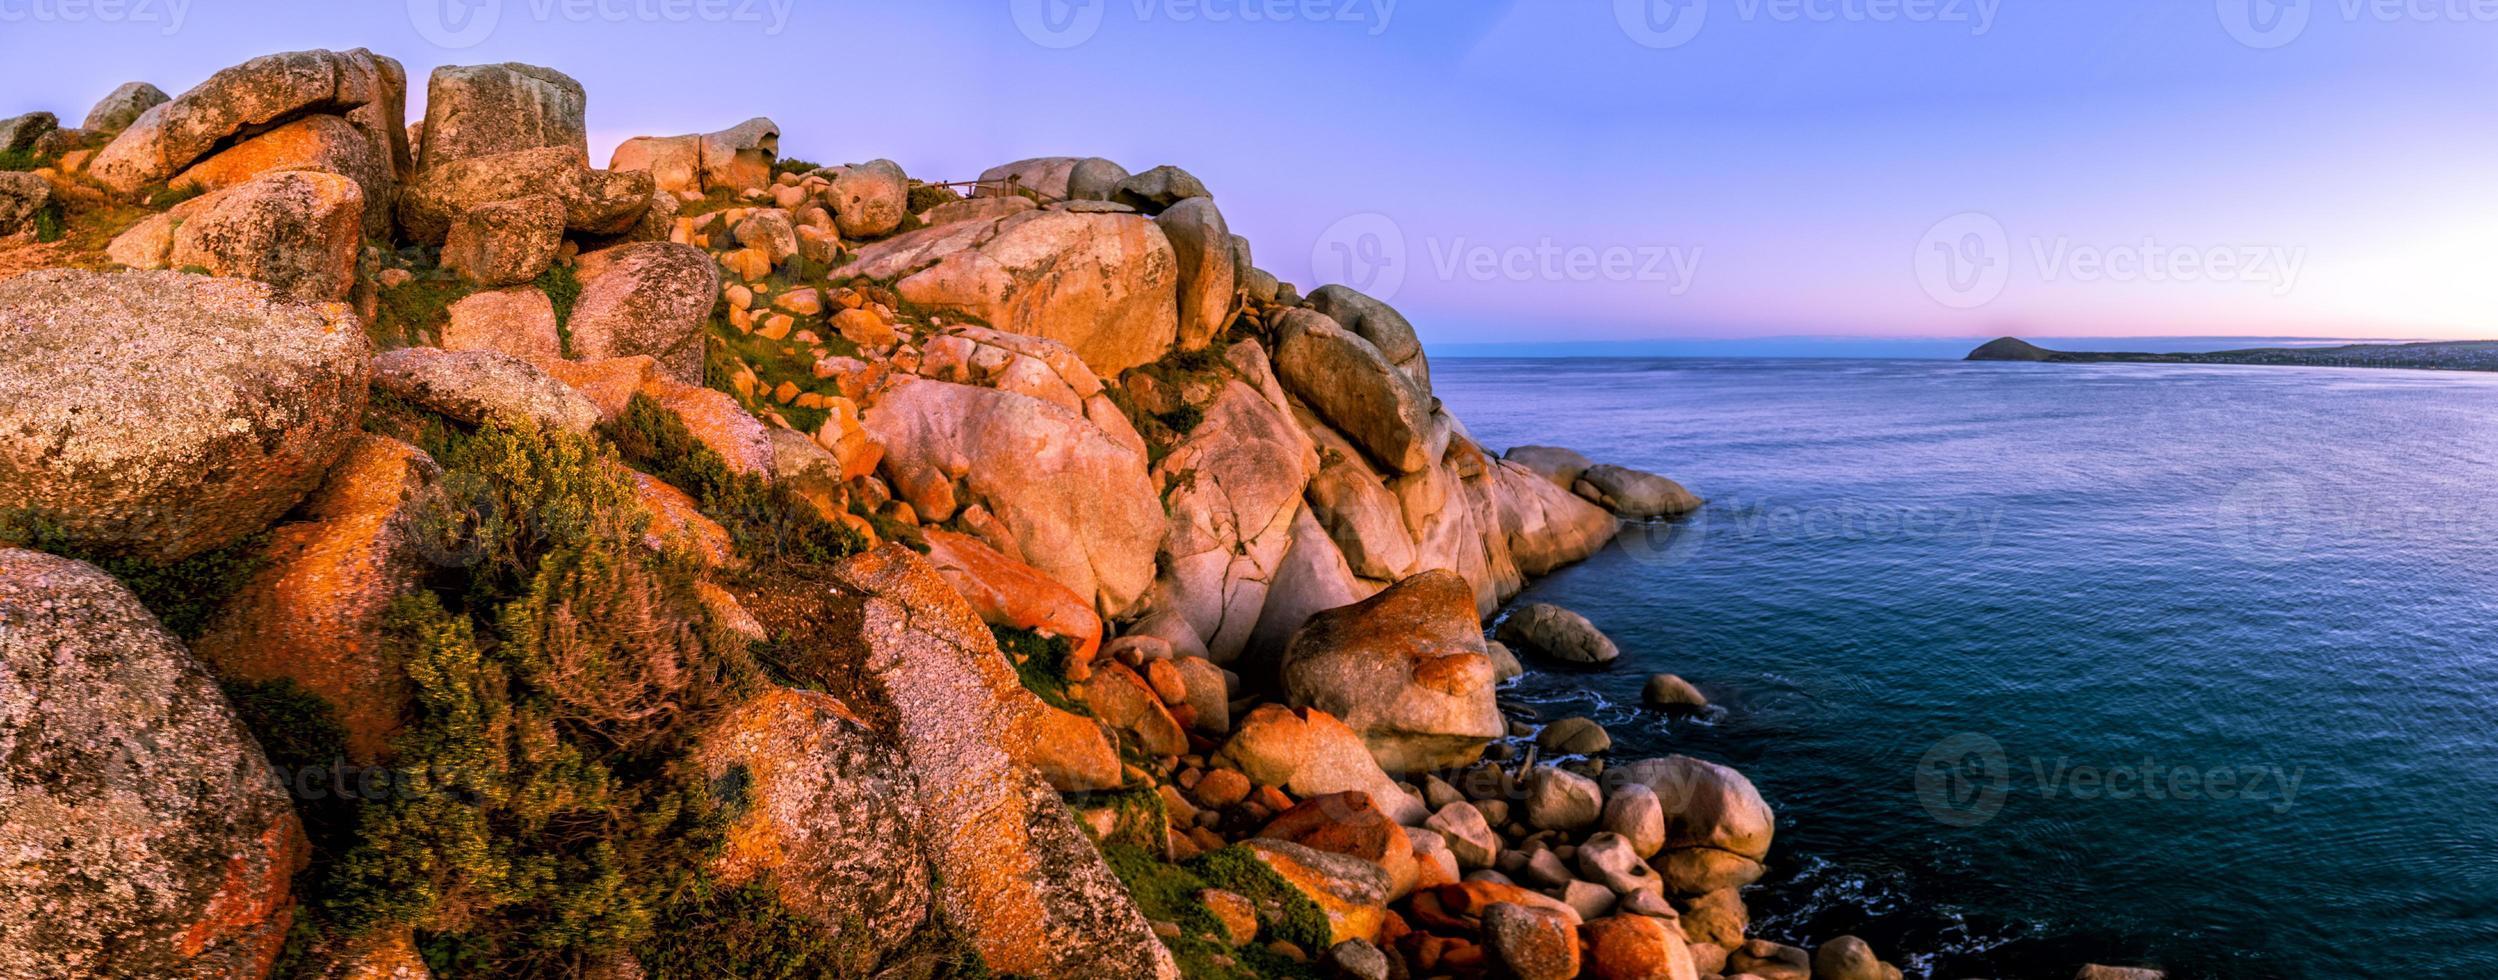 granieten eiland victor haven foto